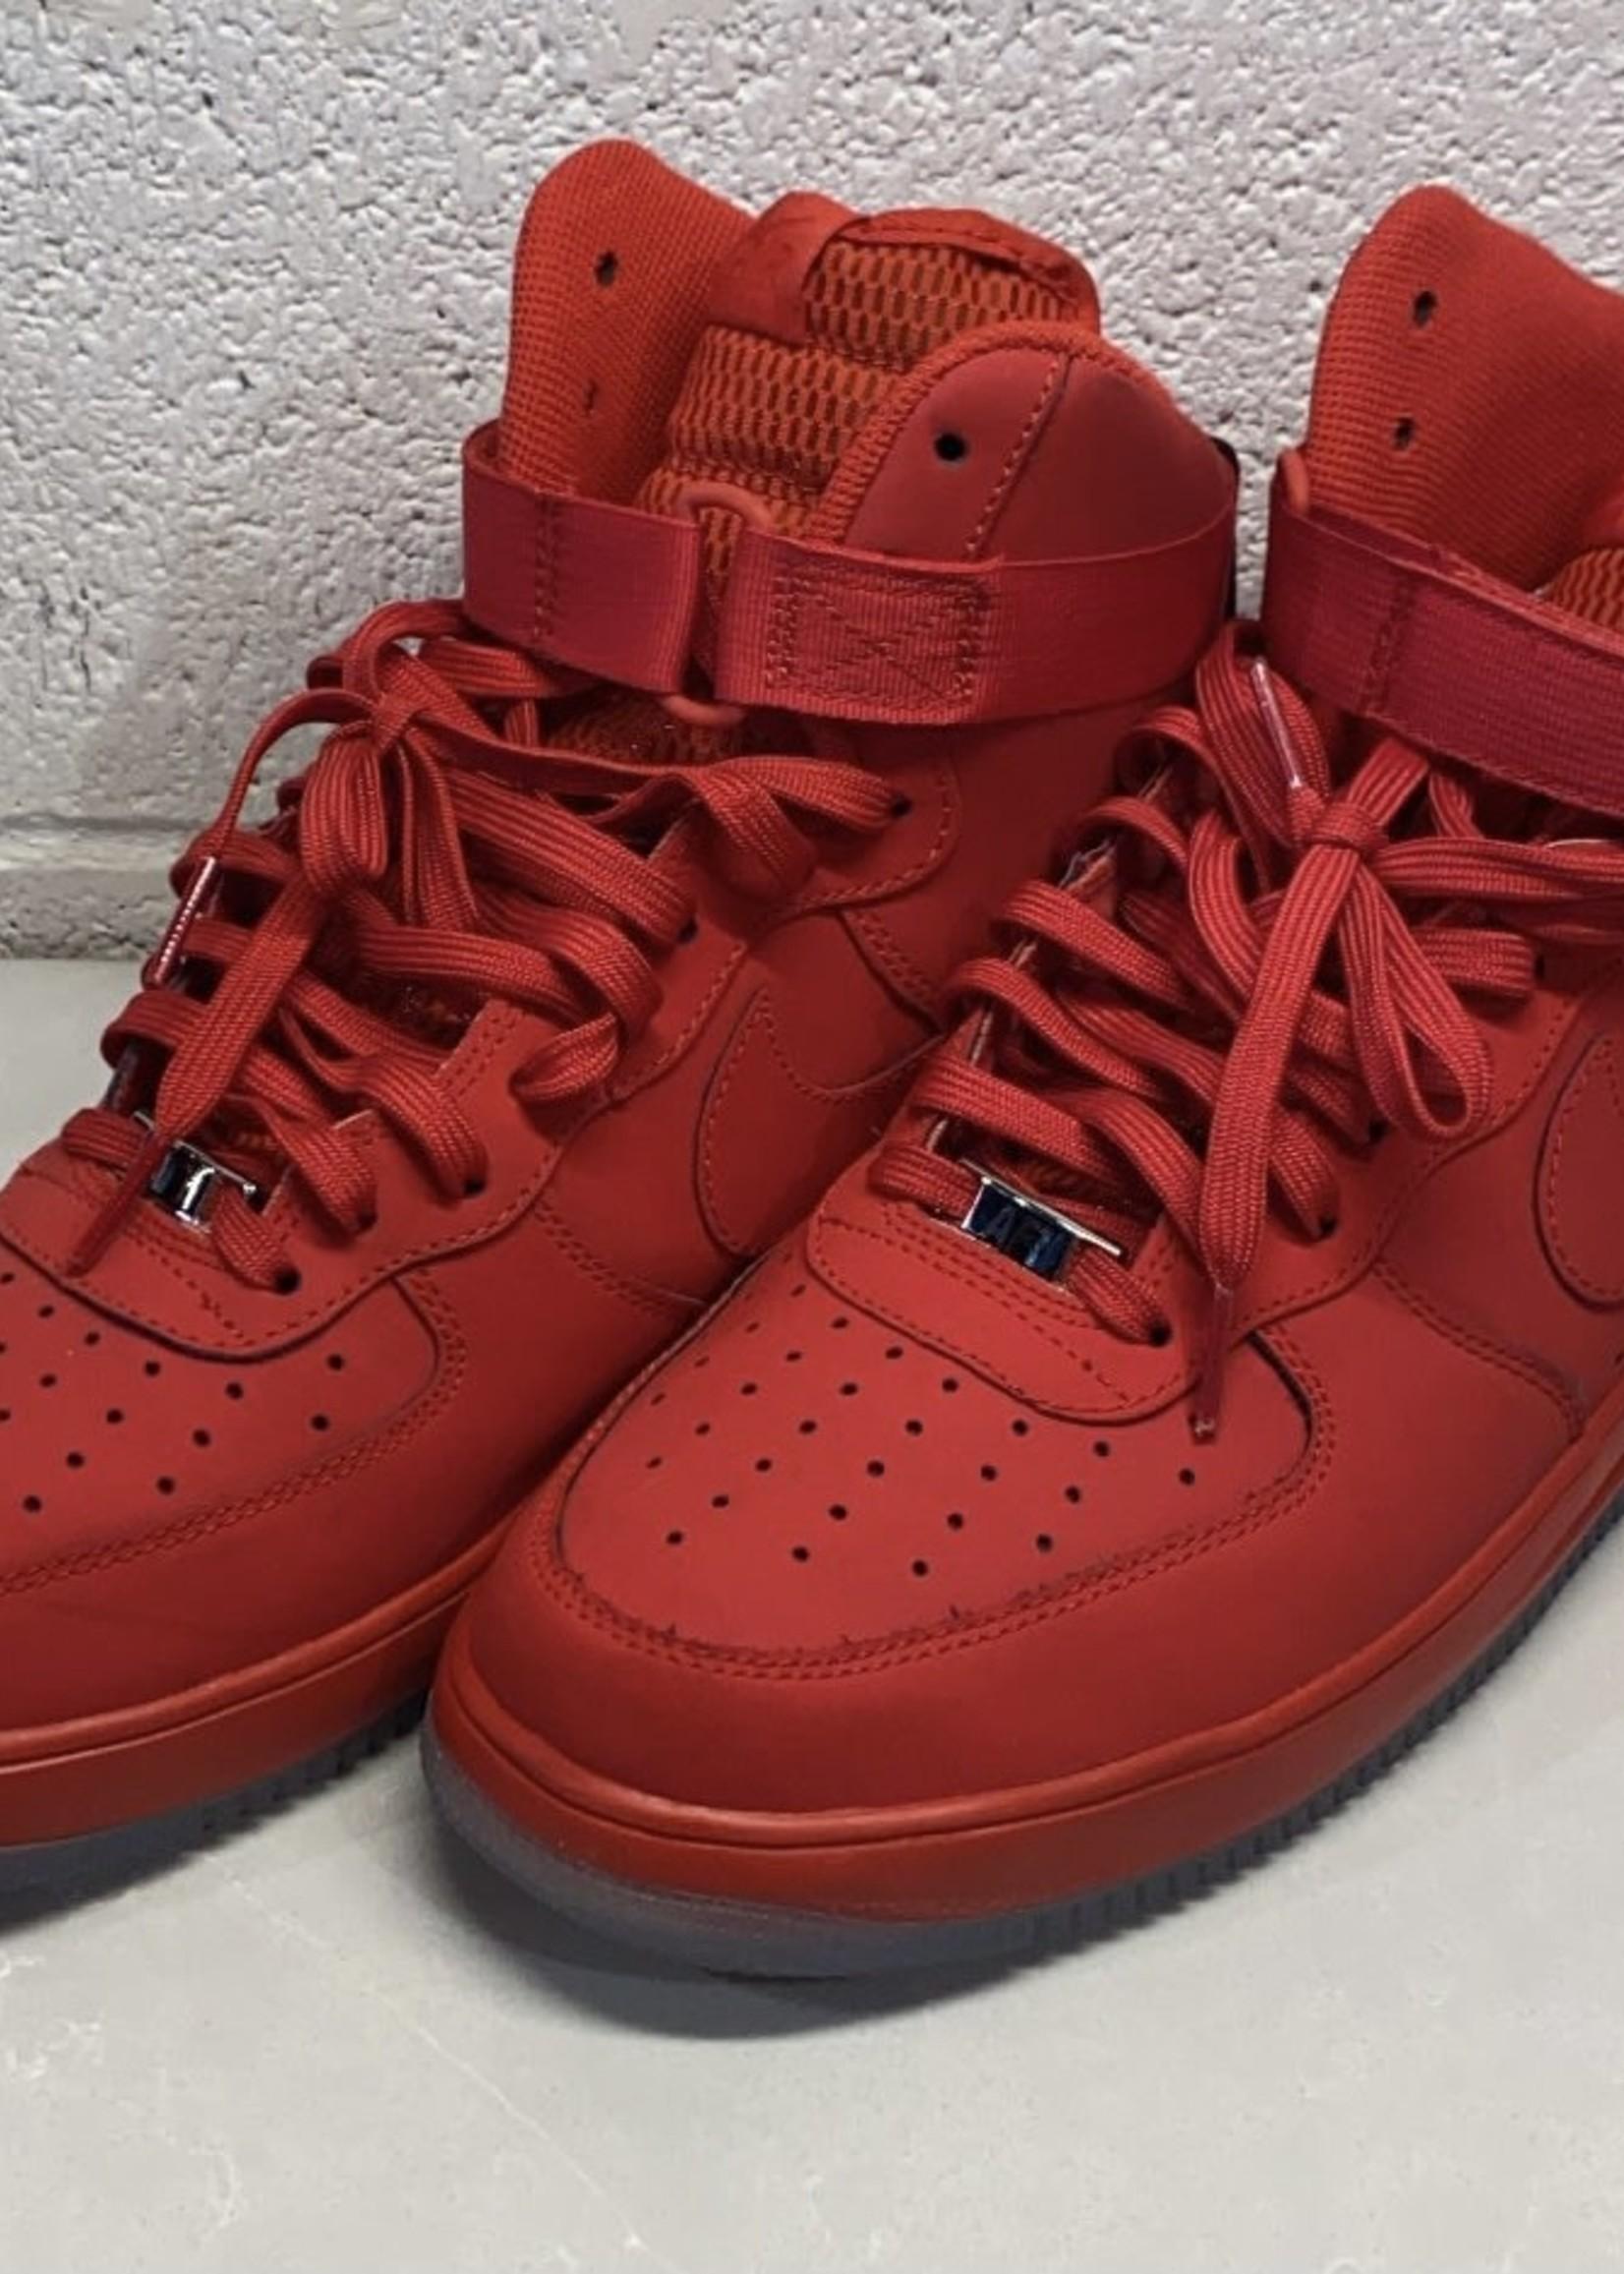 Nike LUNAR FORCE 1 HI '14 'UNIVERSITY RED' 12